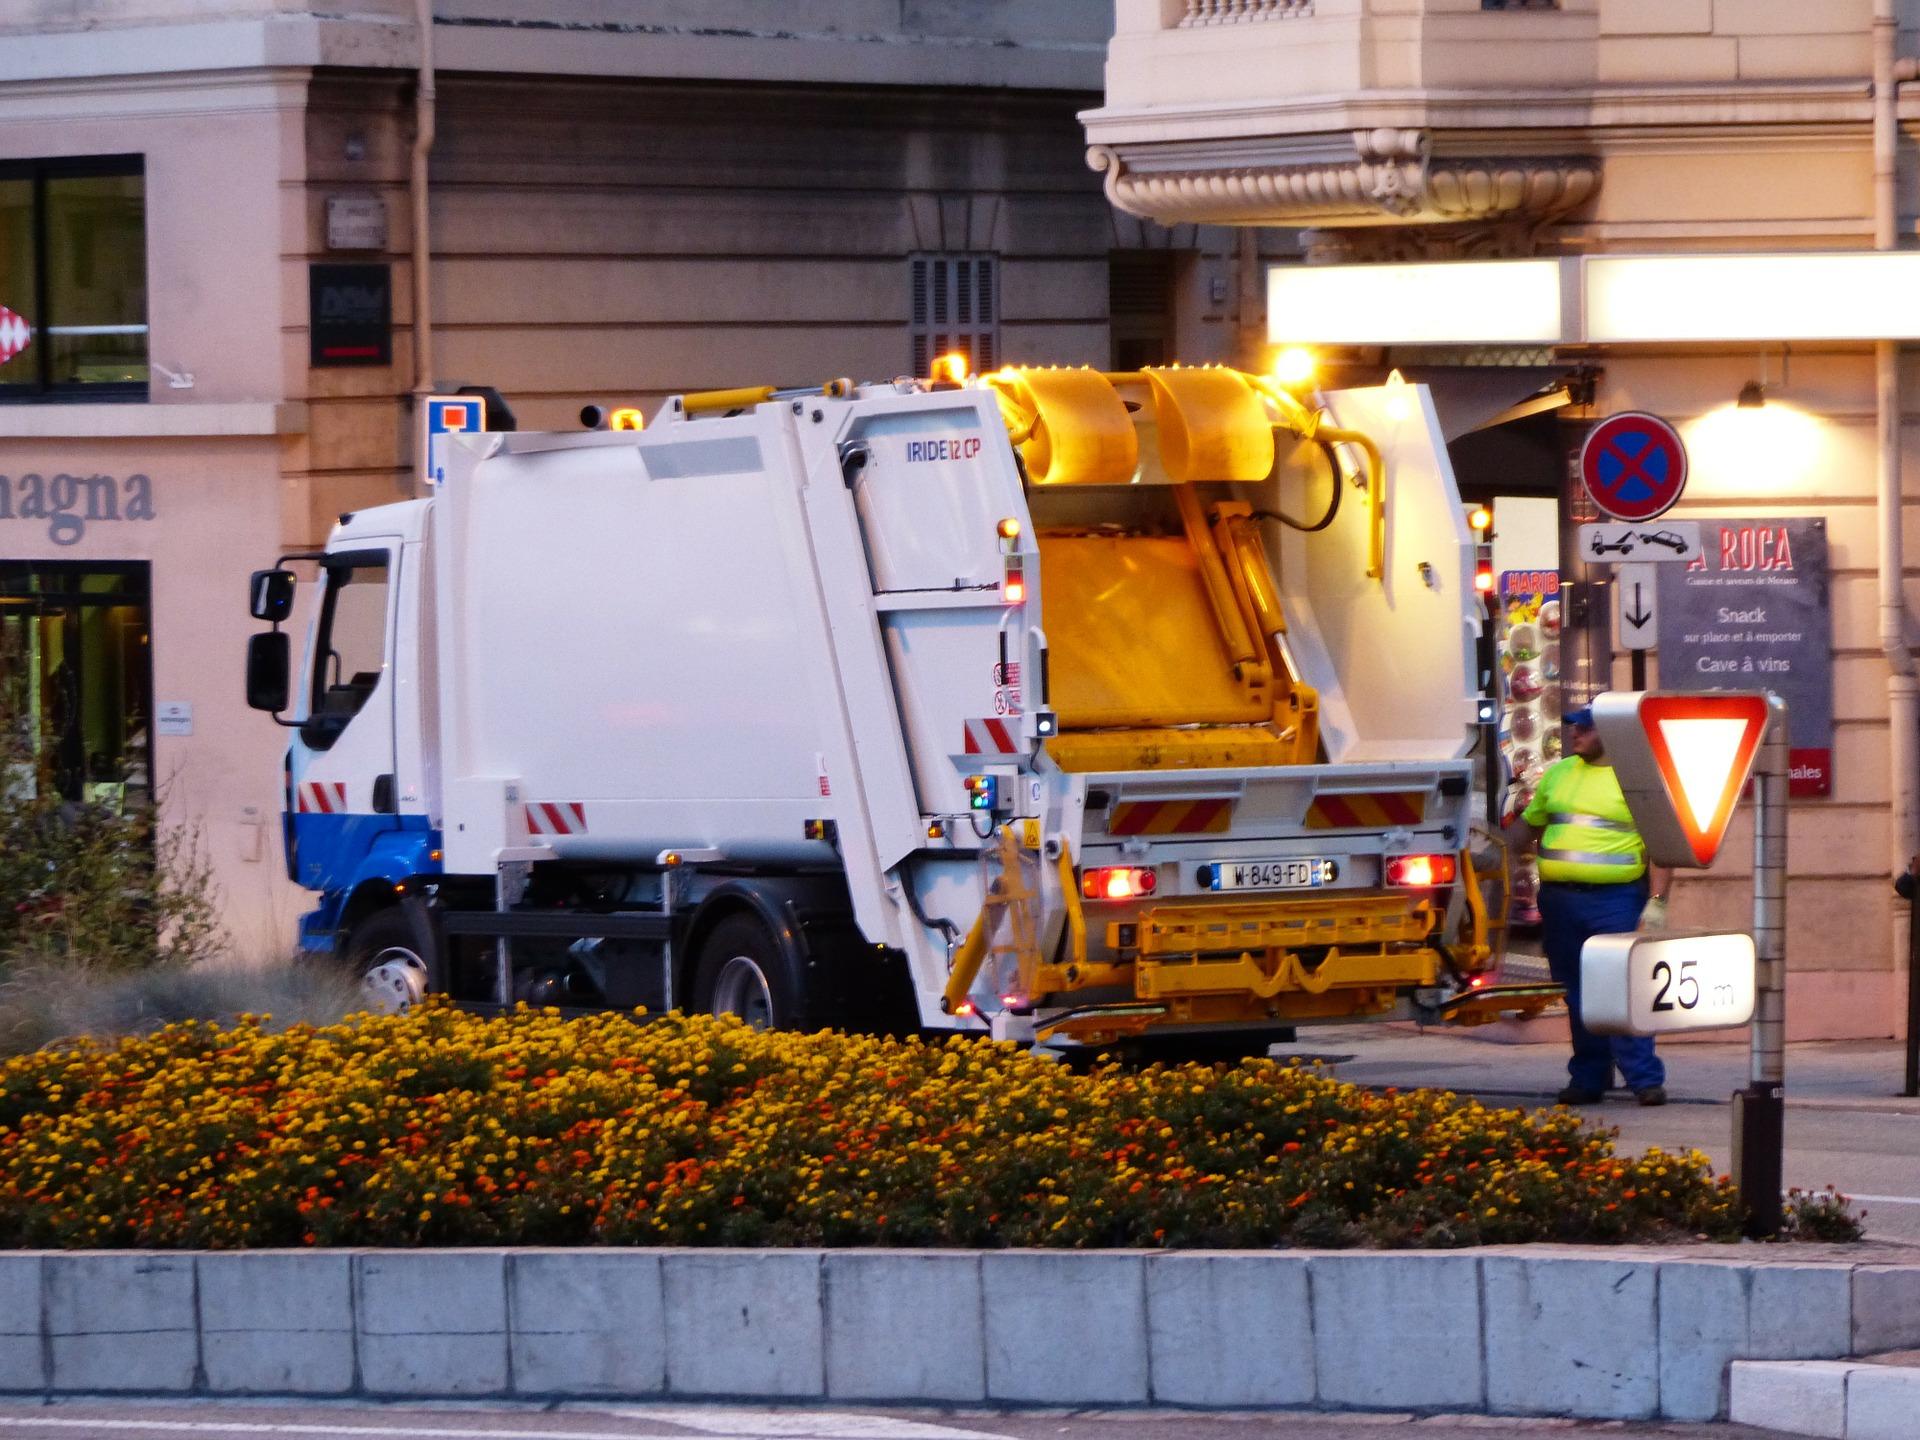 street-cleaning-188997_1920.jpg